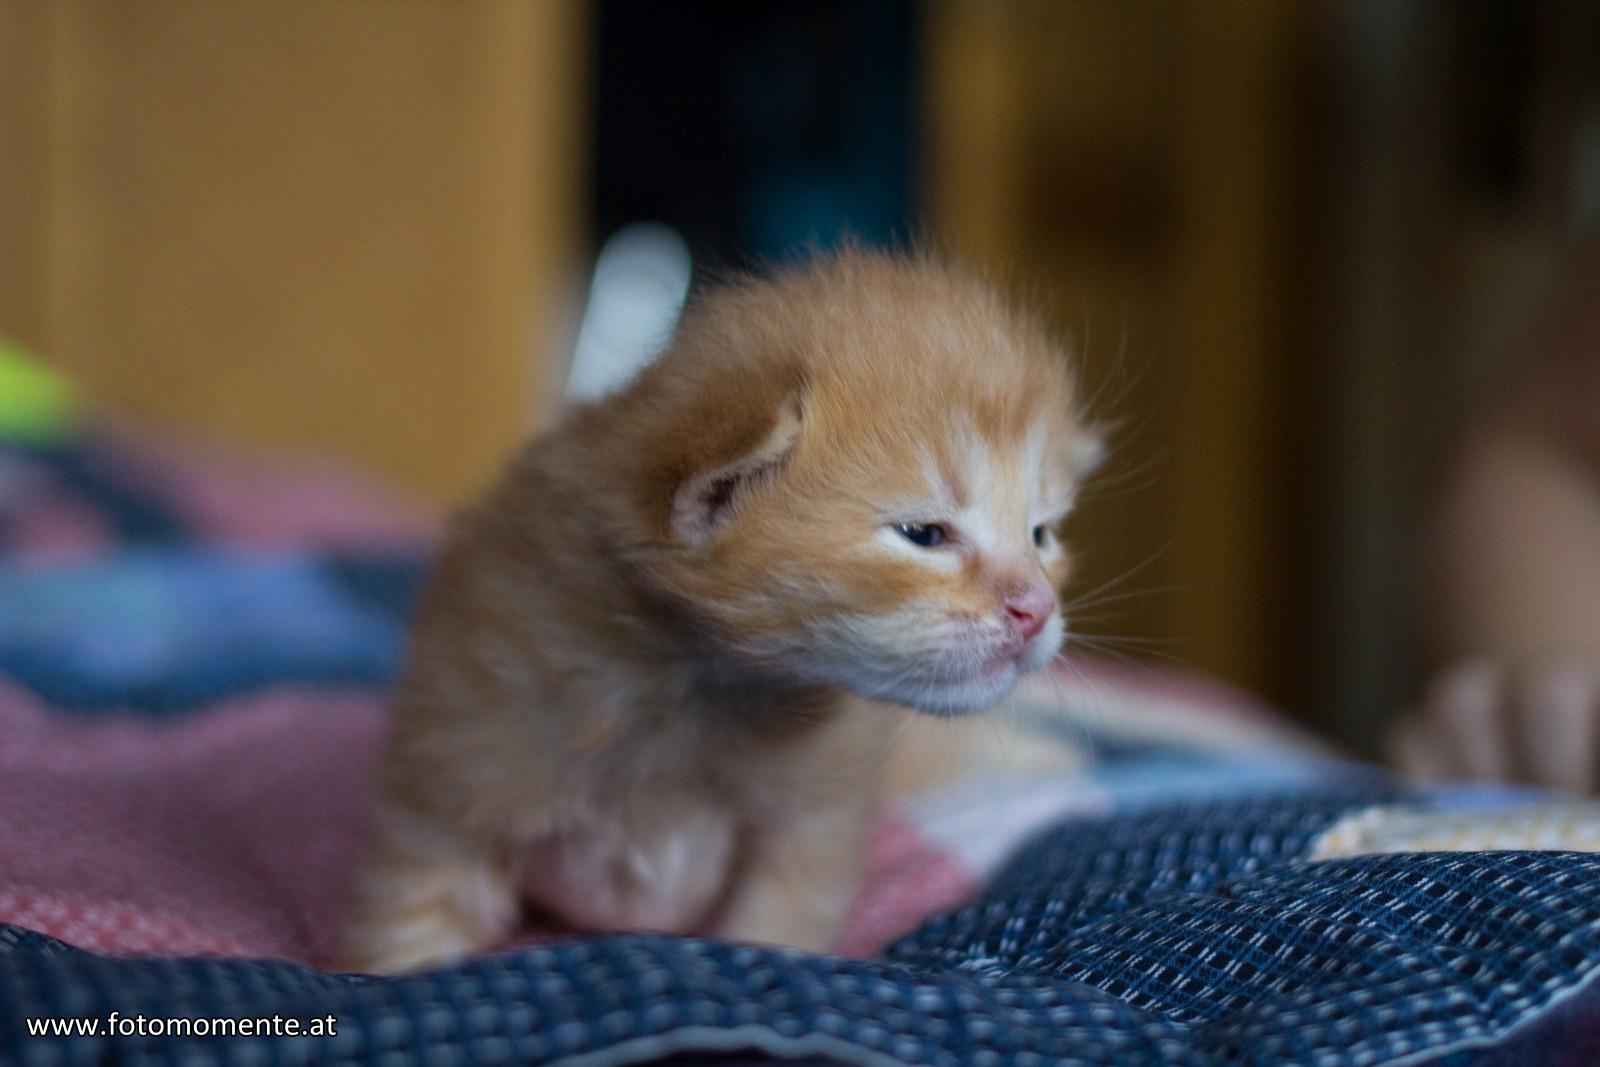 süßes braunes katzenbabys drei wochen alt 1 - Drei herzige Katzenbabys :)